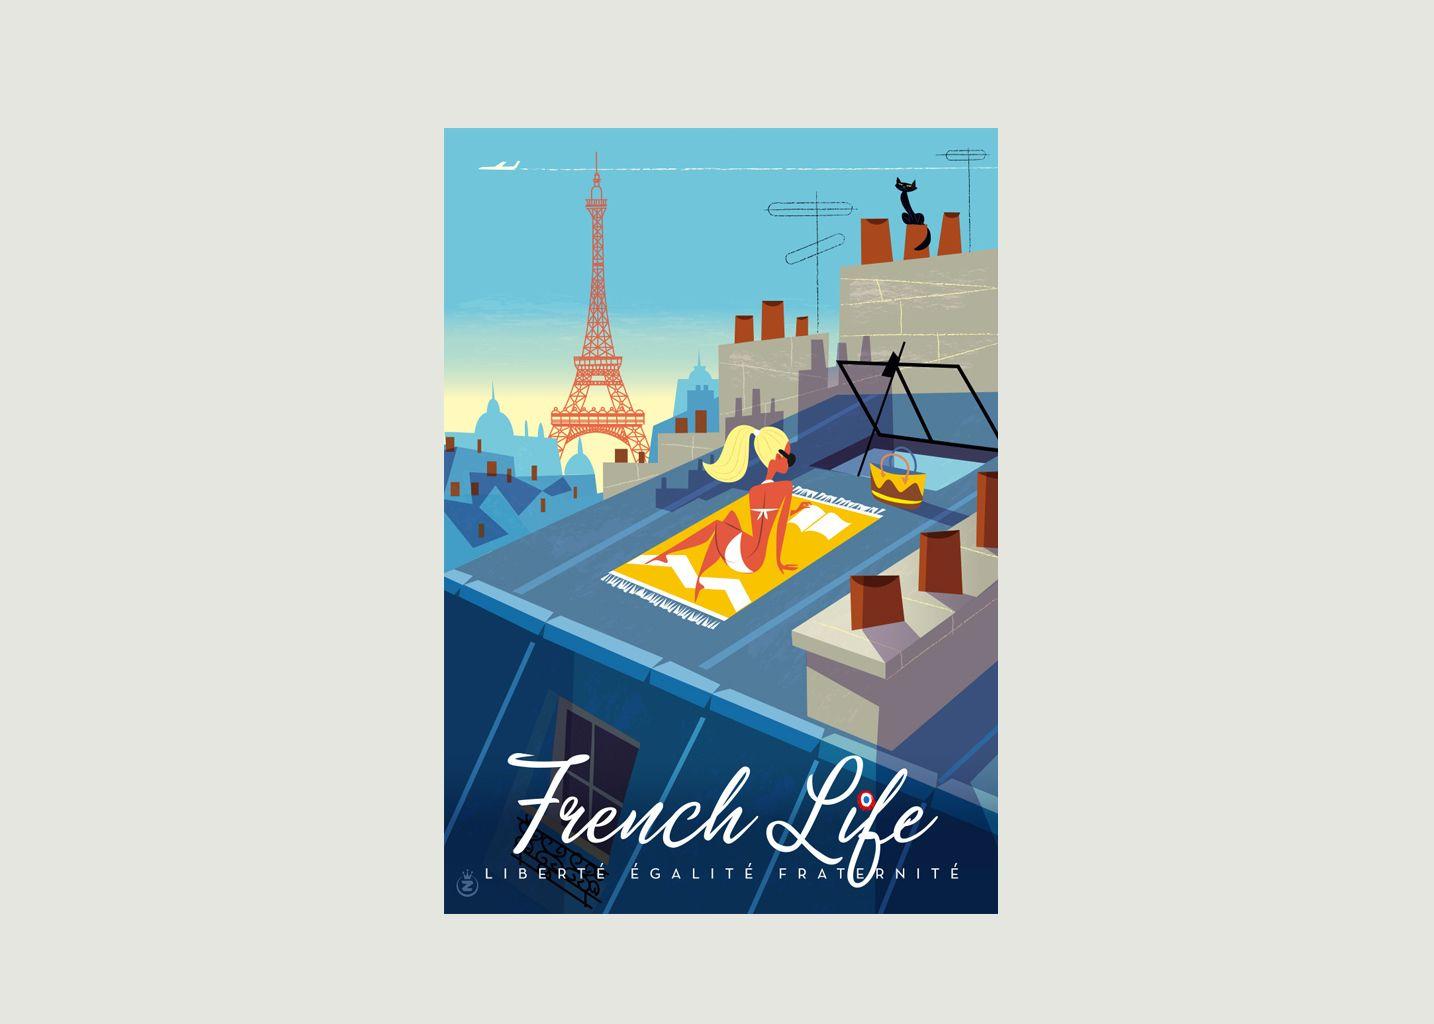 Affiche Monsieur Z French Life - Image Republic